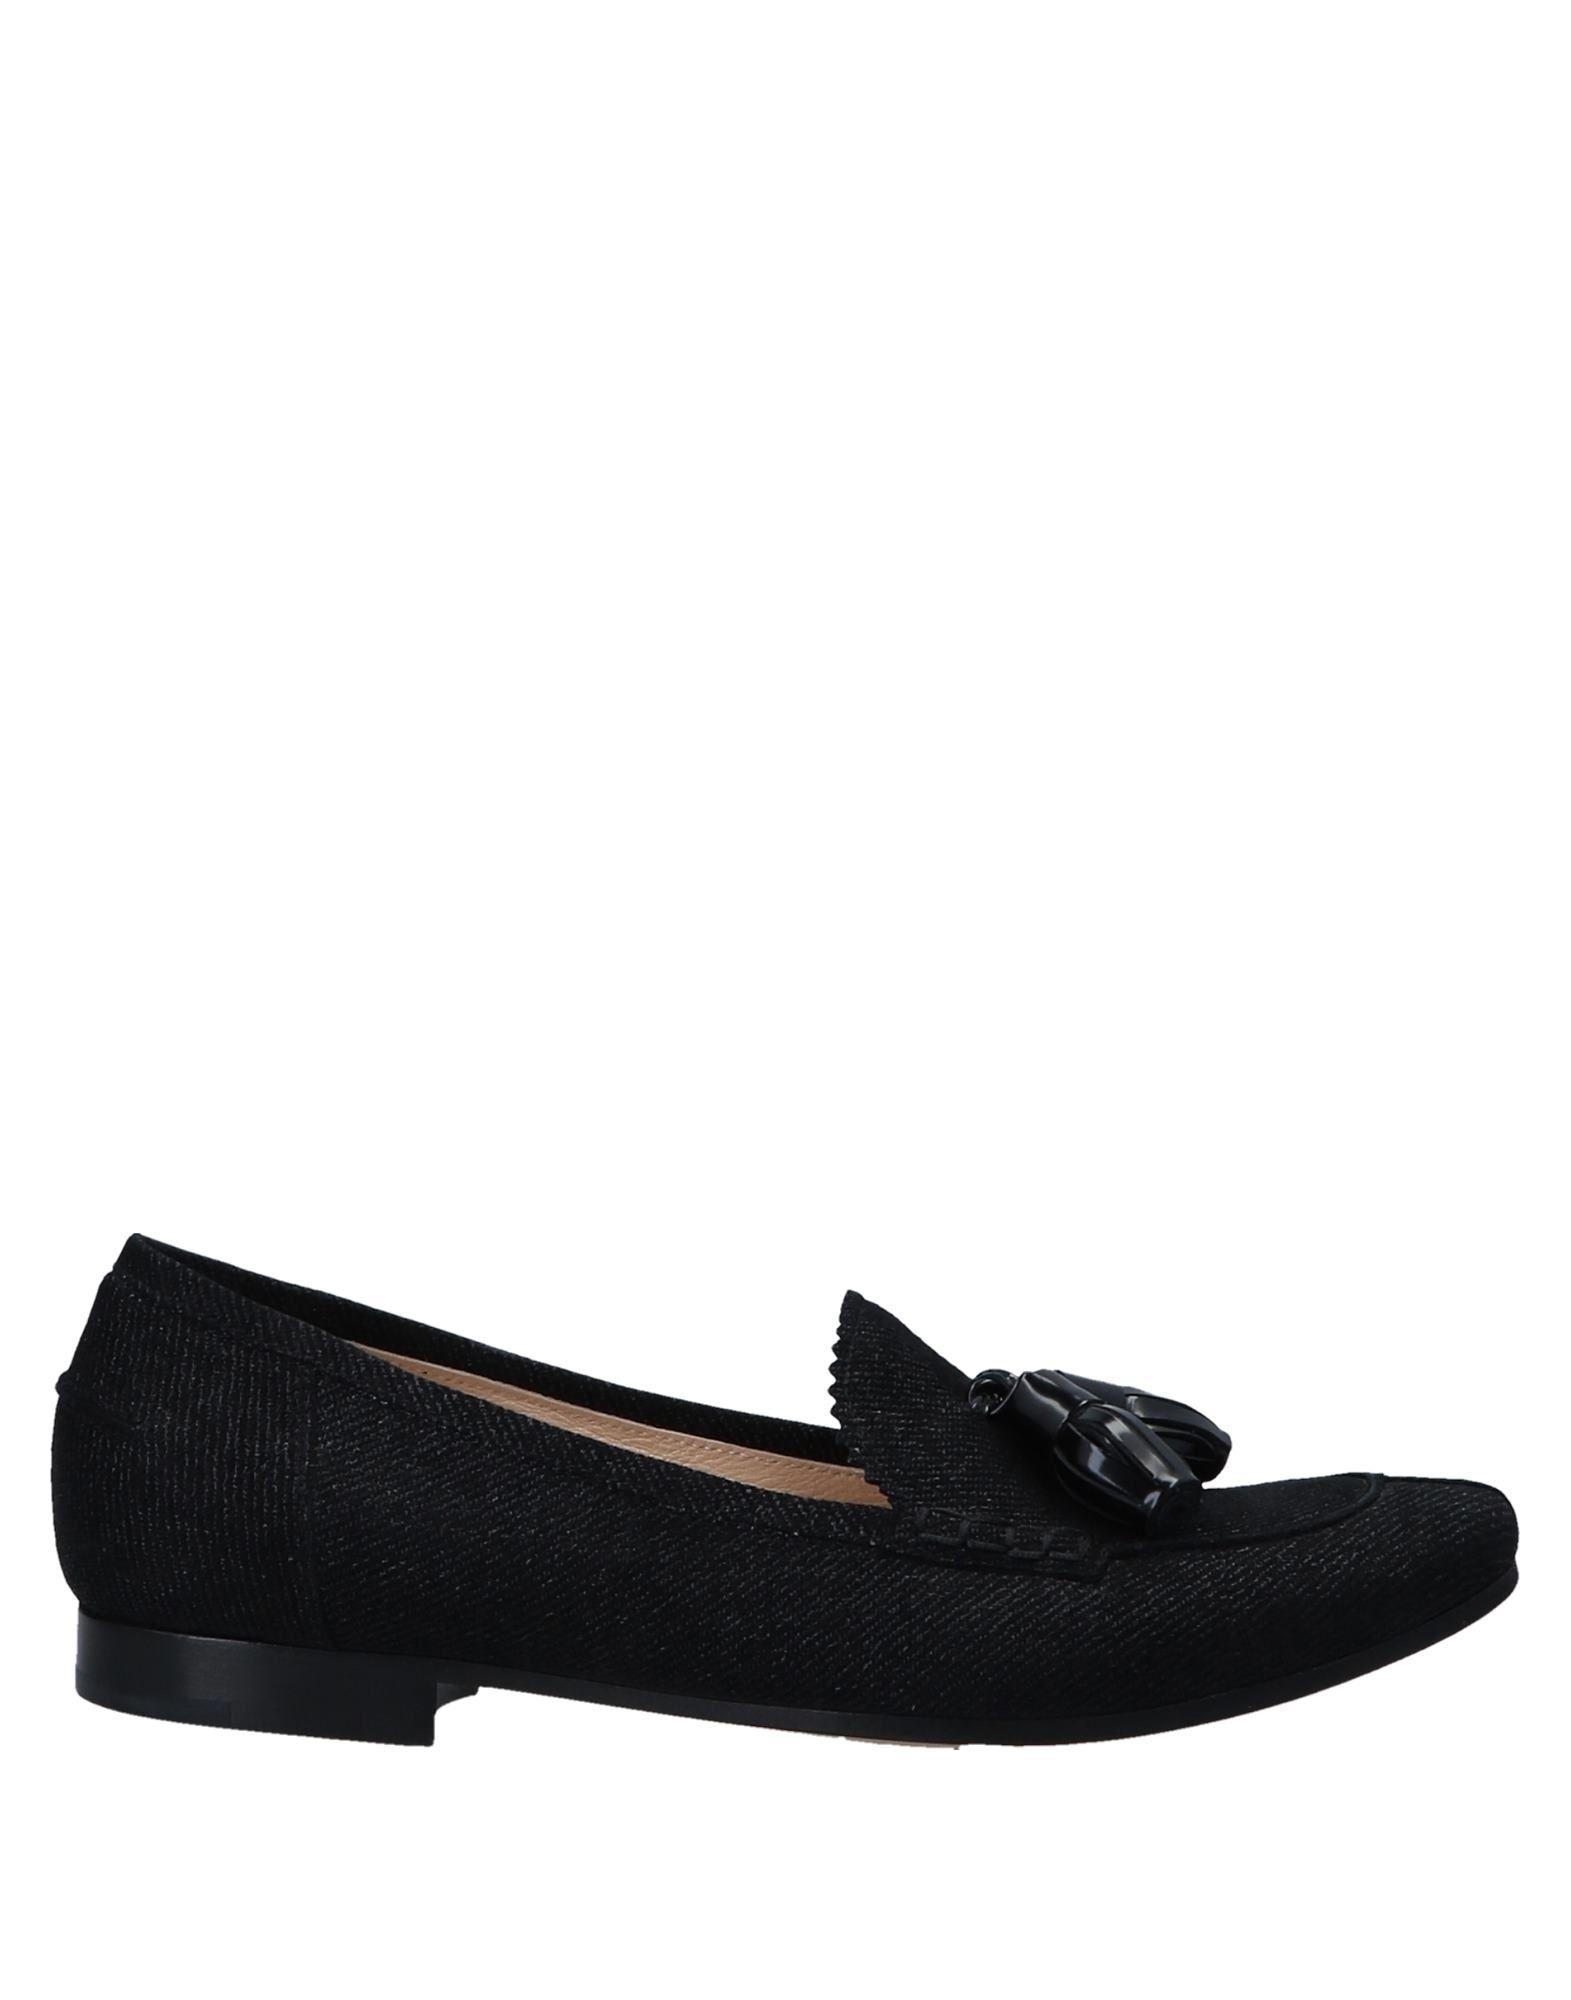 Stilvolle billige Schuhe Pellico Mokassins Damen  11562294DX